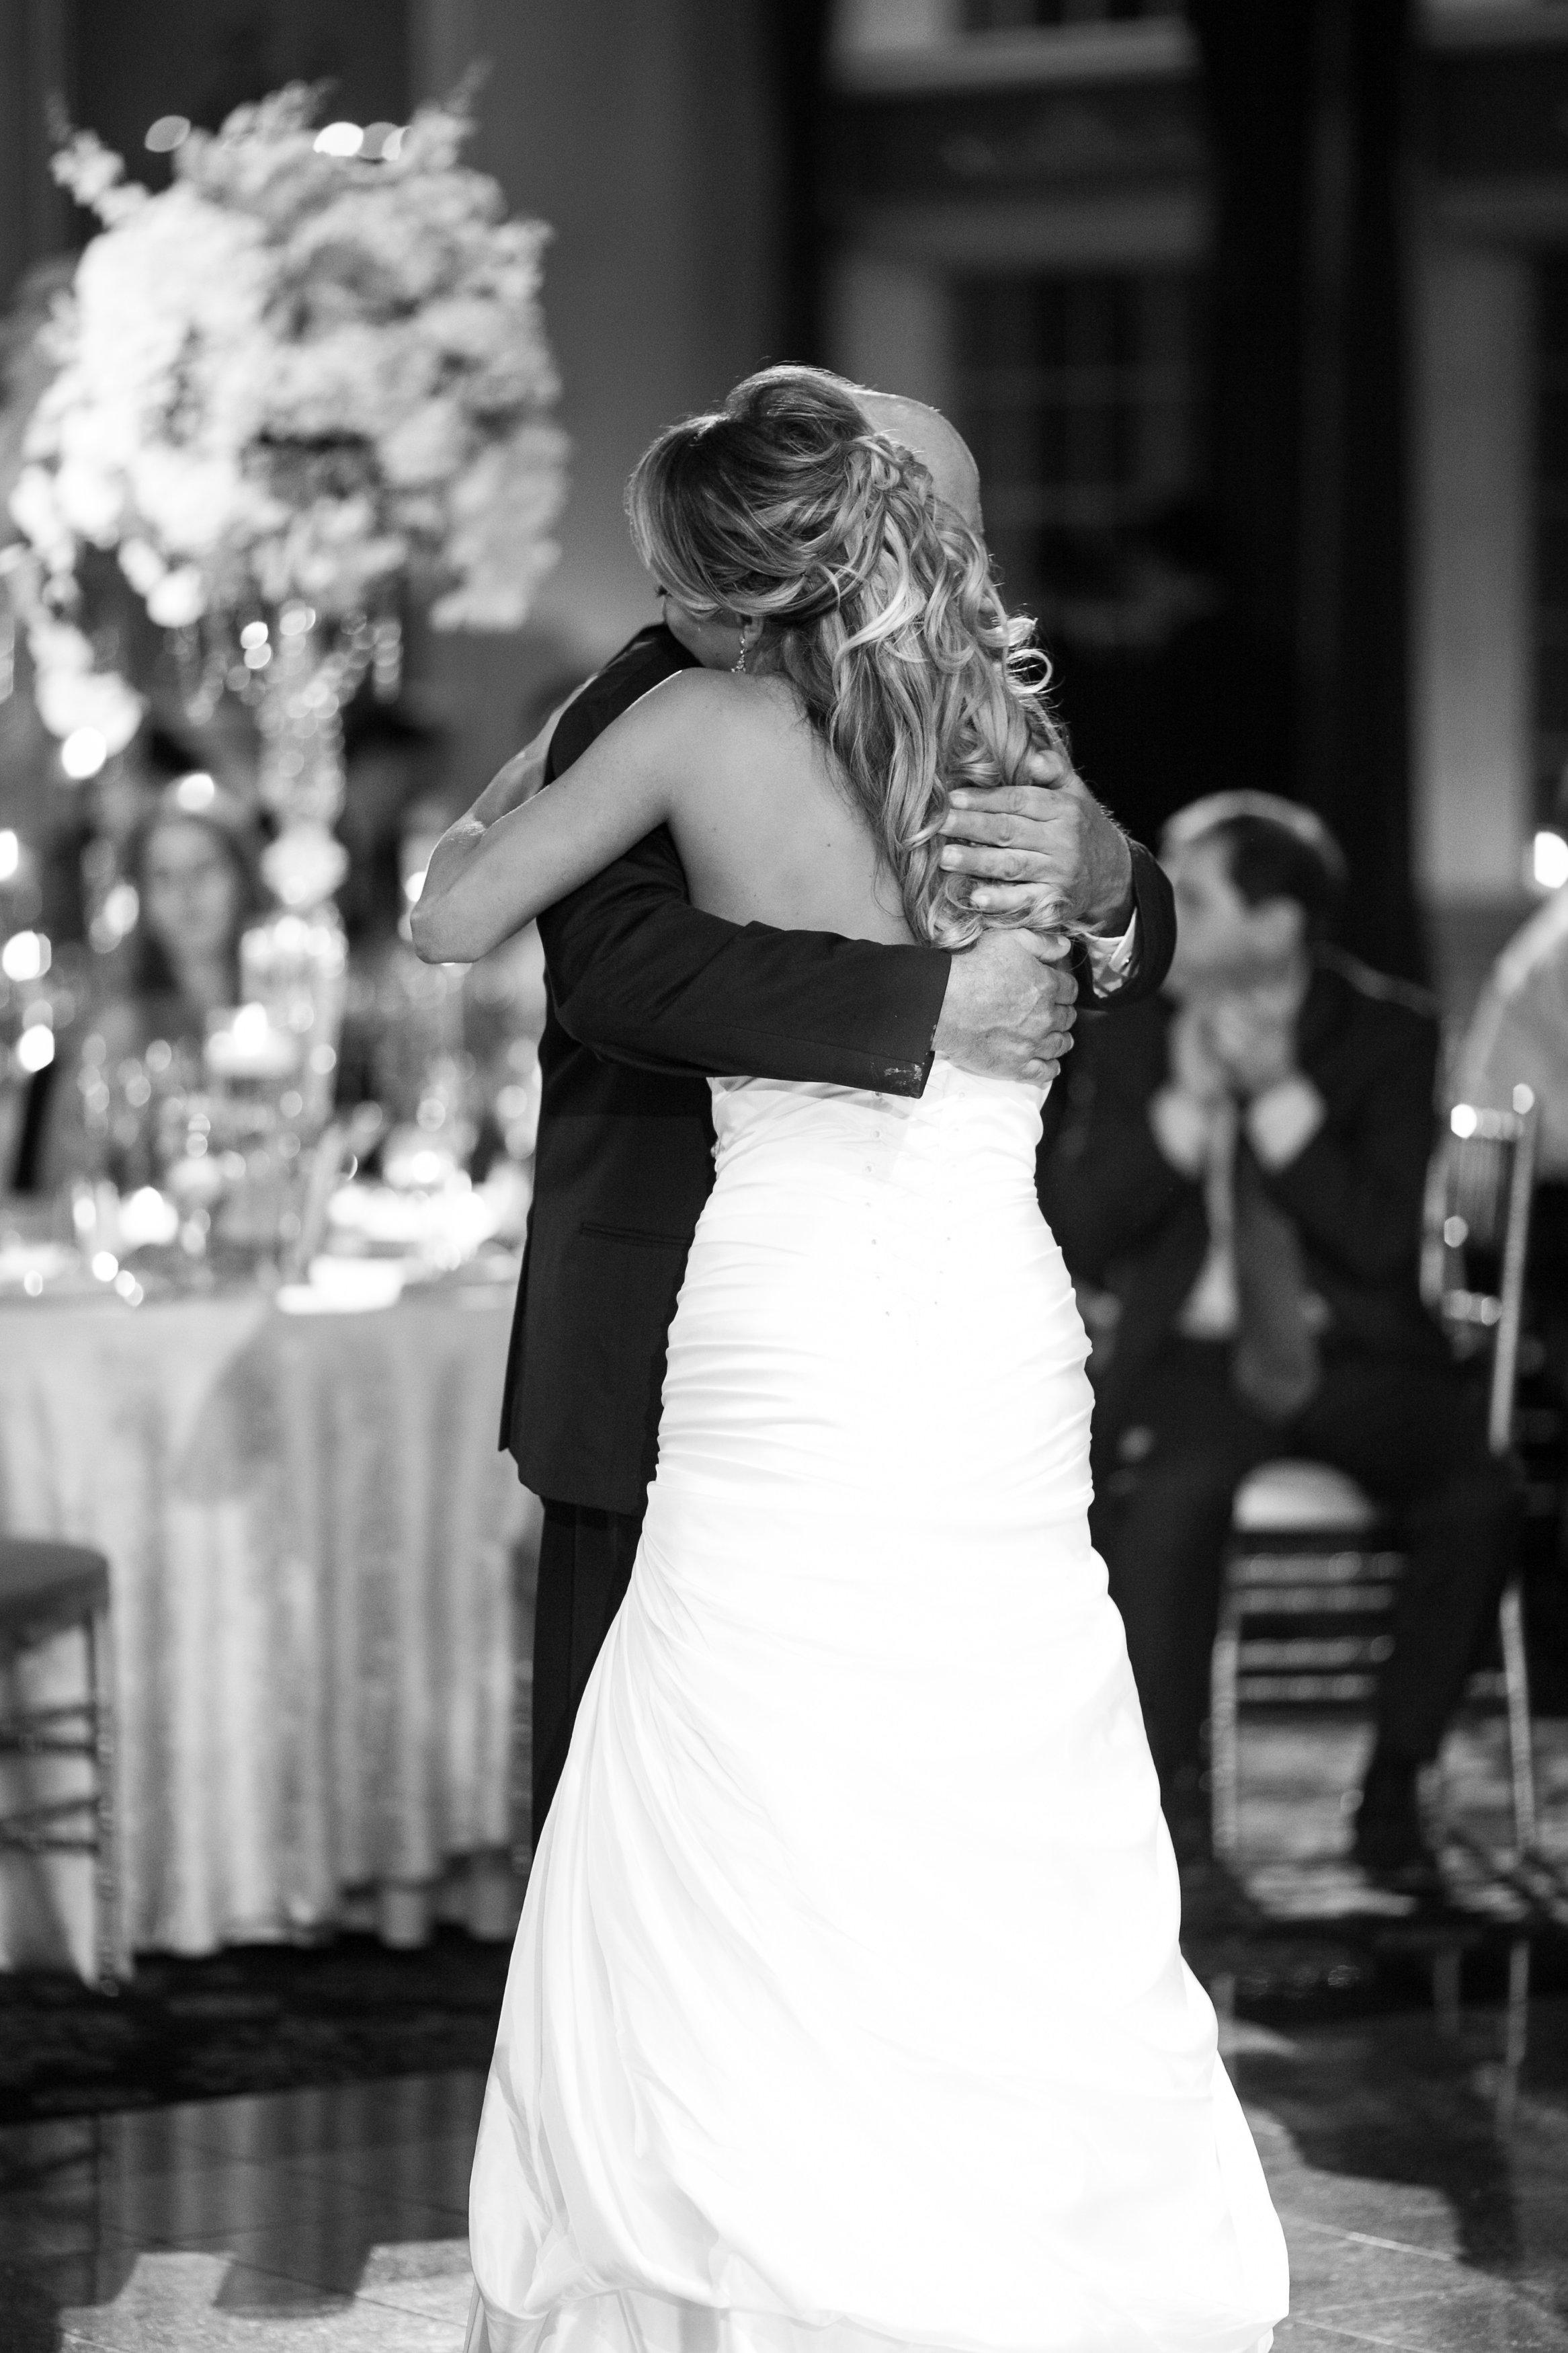 Ceci_New_York_Custom_Invitation_ New_Jersey_Wedding_Luxury_Personalized_Ceci_Style_Bride_Foil_Stamping167.JPG